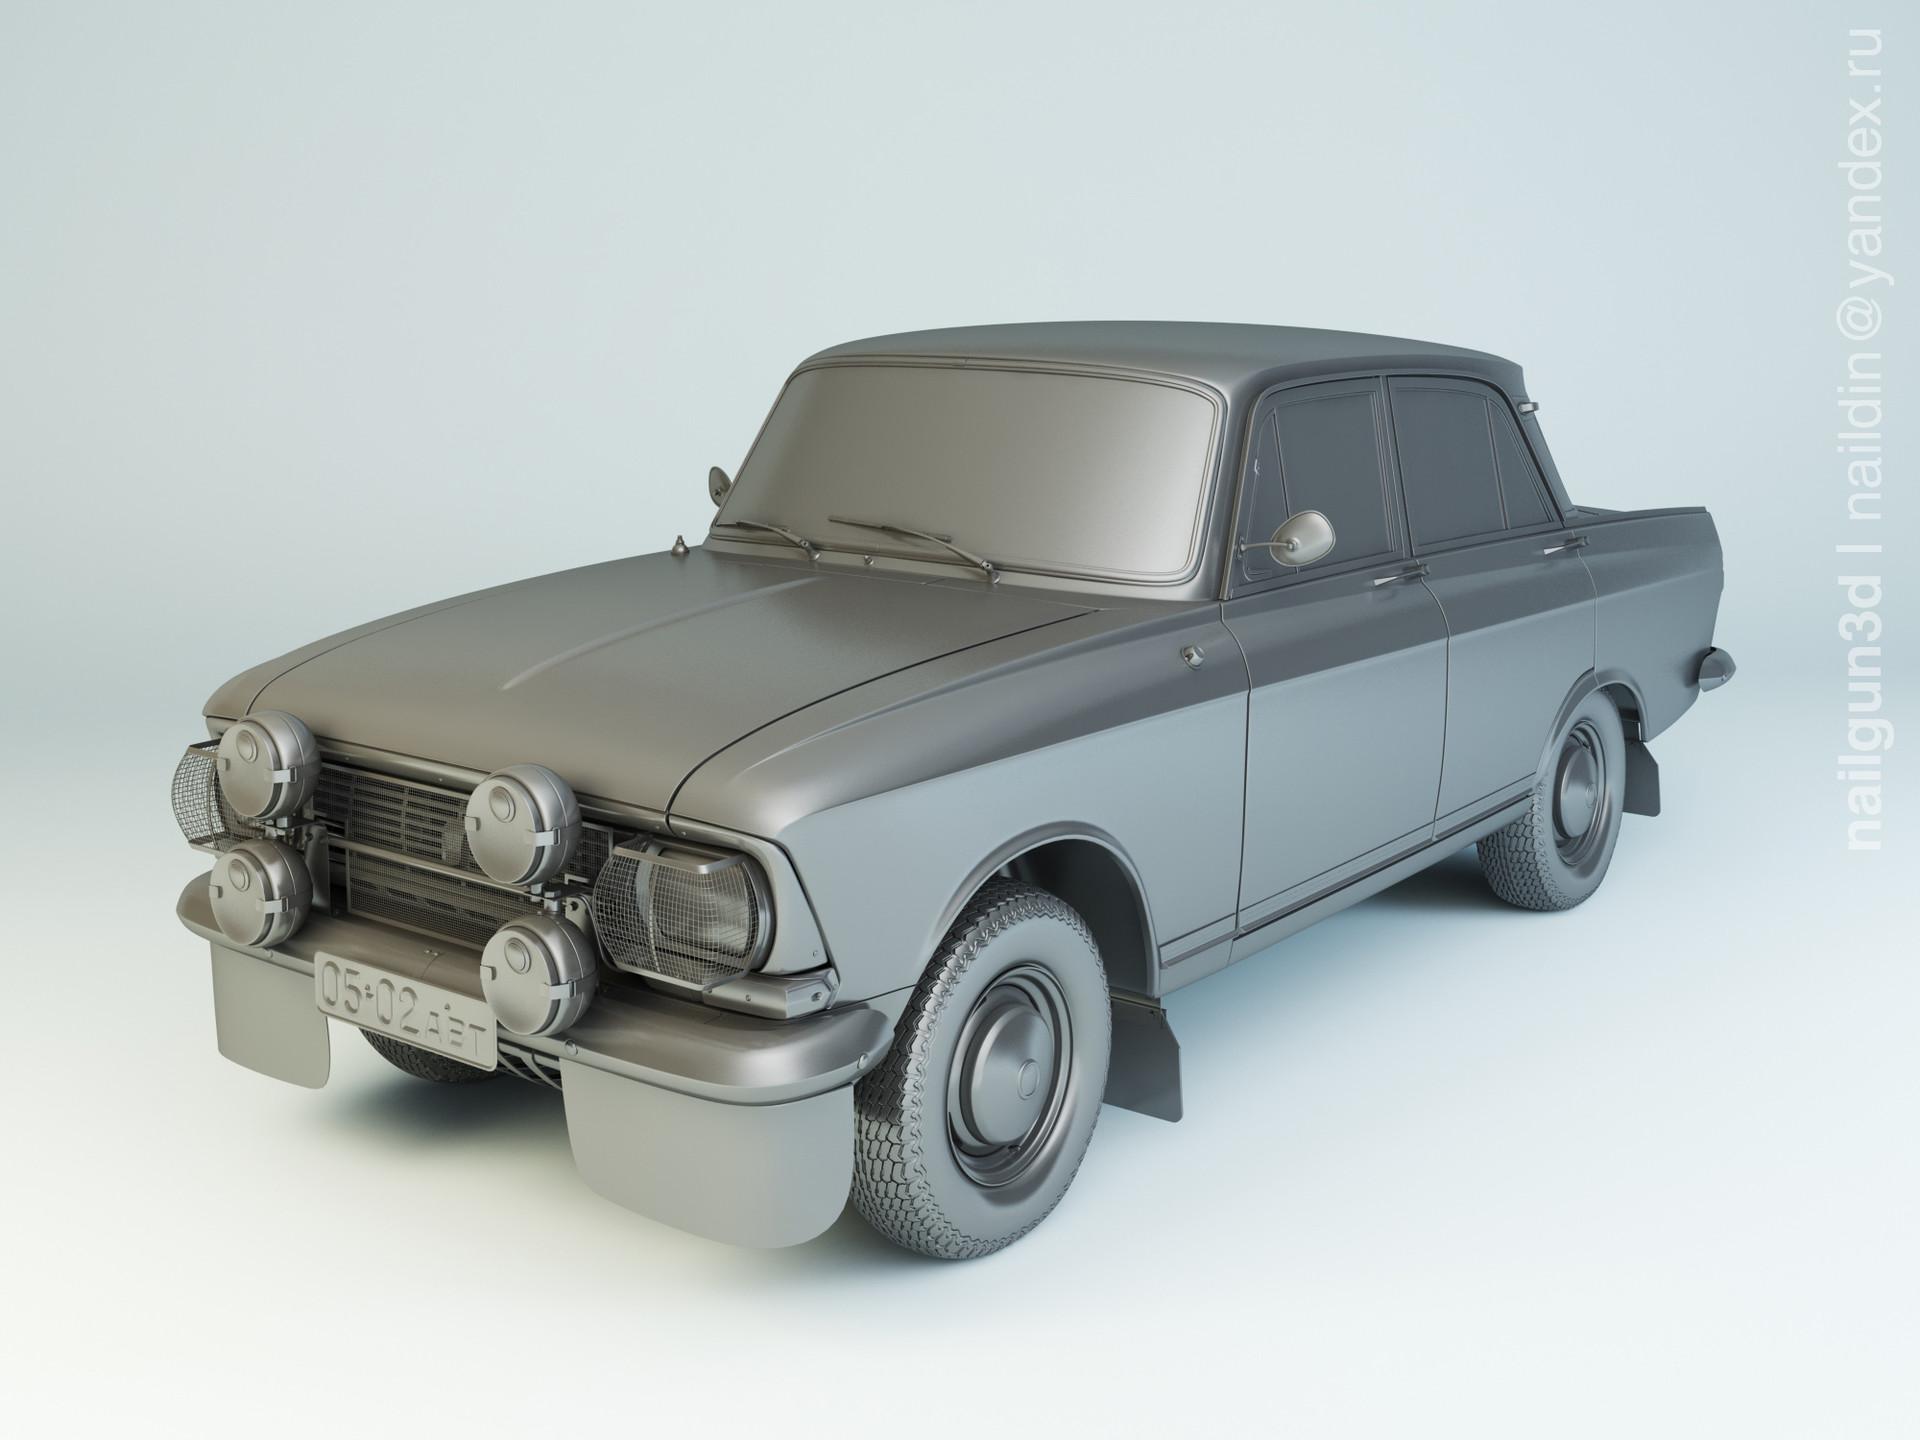 Nail khusnutdinov als 211 002 azlk moskvich 412 rally modelling 0